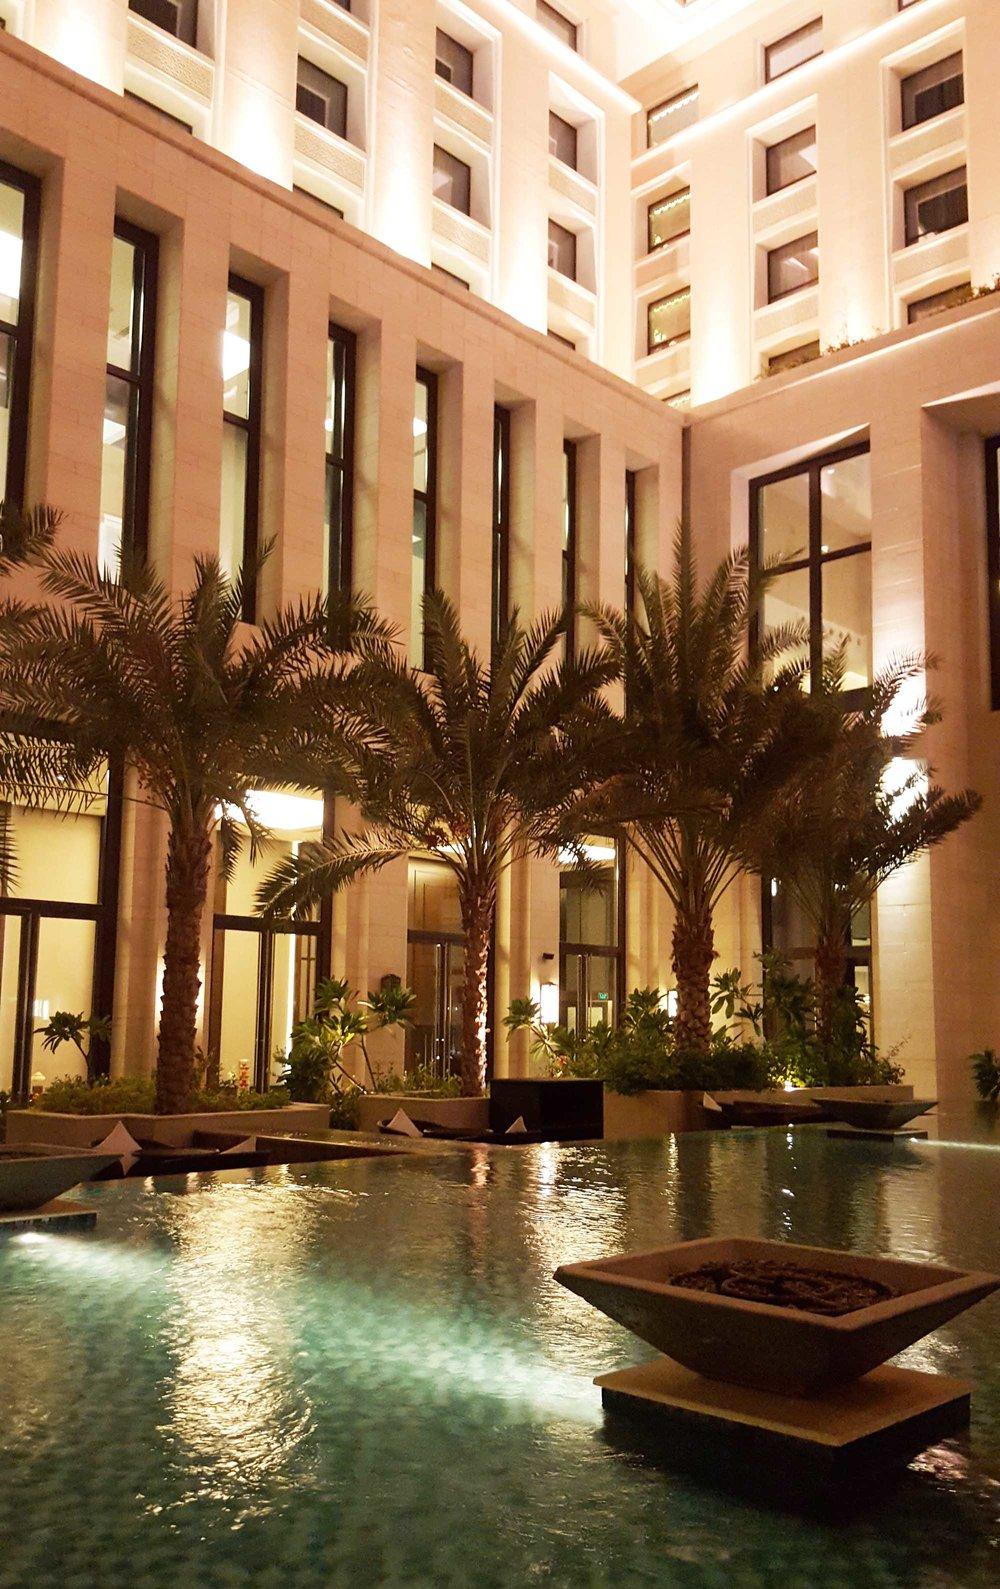 Hormuz Grand courtyard pool and palms1.jpg